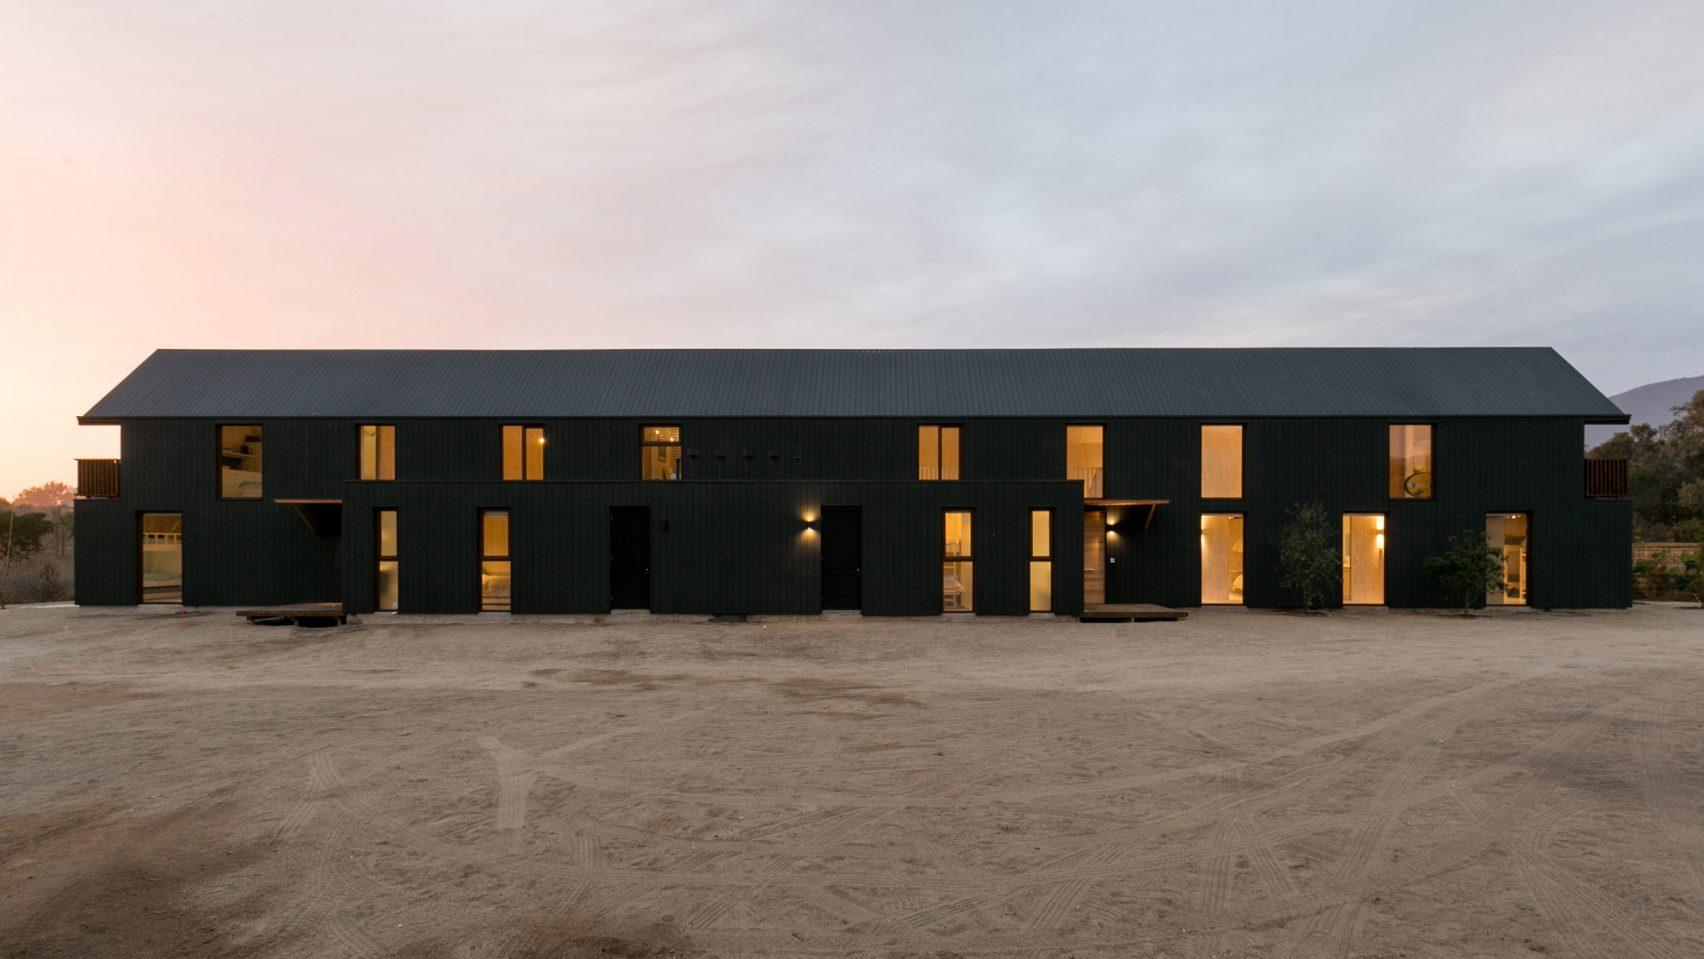 shotgun-house-alejandro-soffia-architecture-black-wood-chile_dezeen_2364_hero-1704x959.jpg